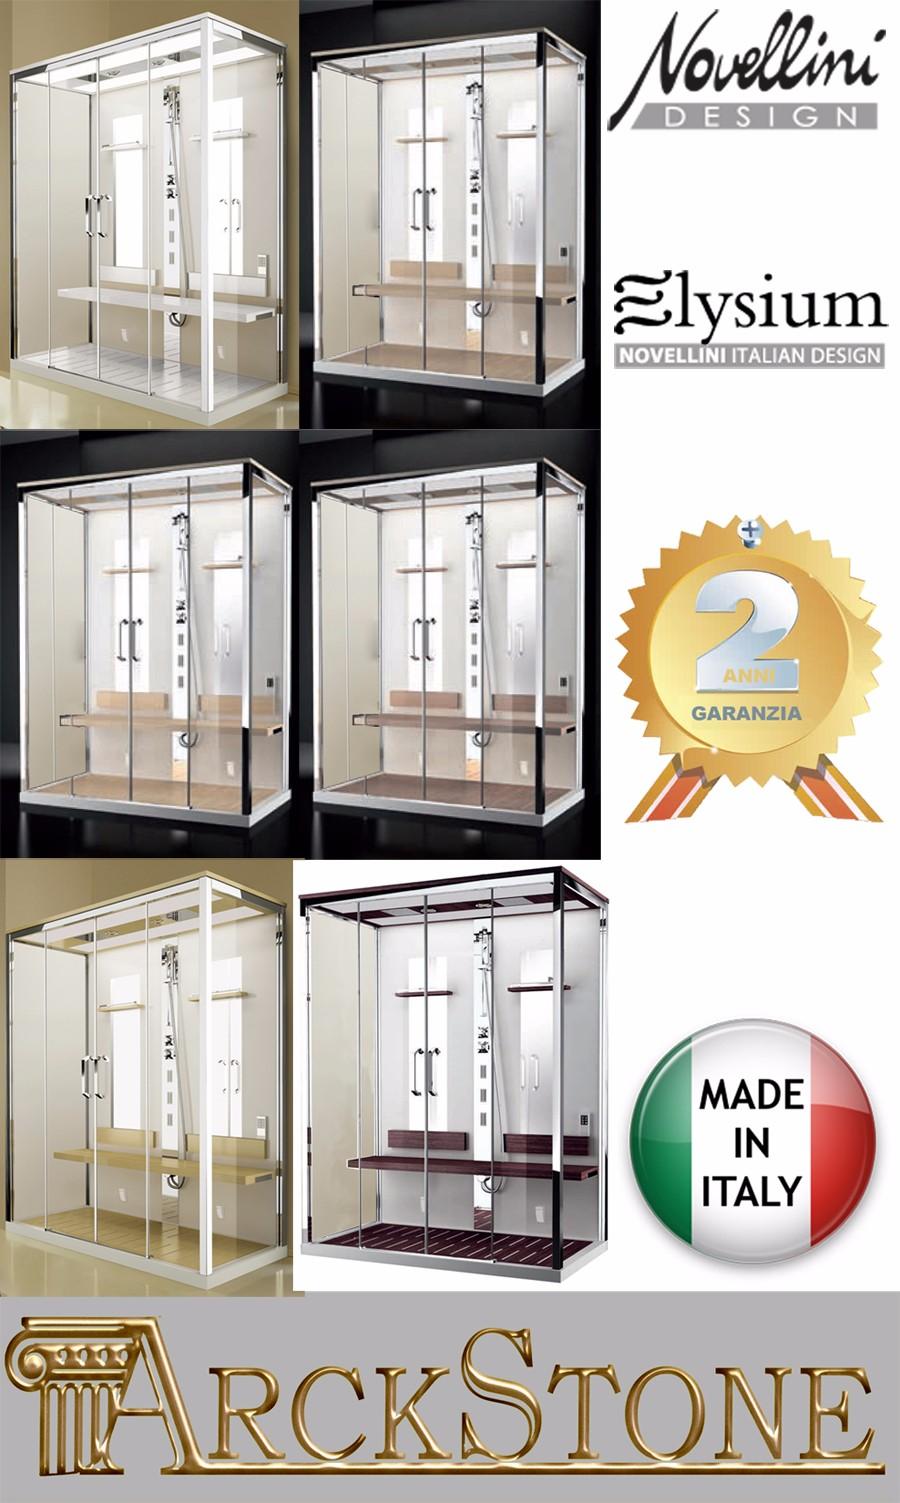 arckstone cabine hydro sauna chromothérapie novellini elysium nexis